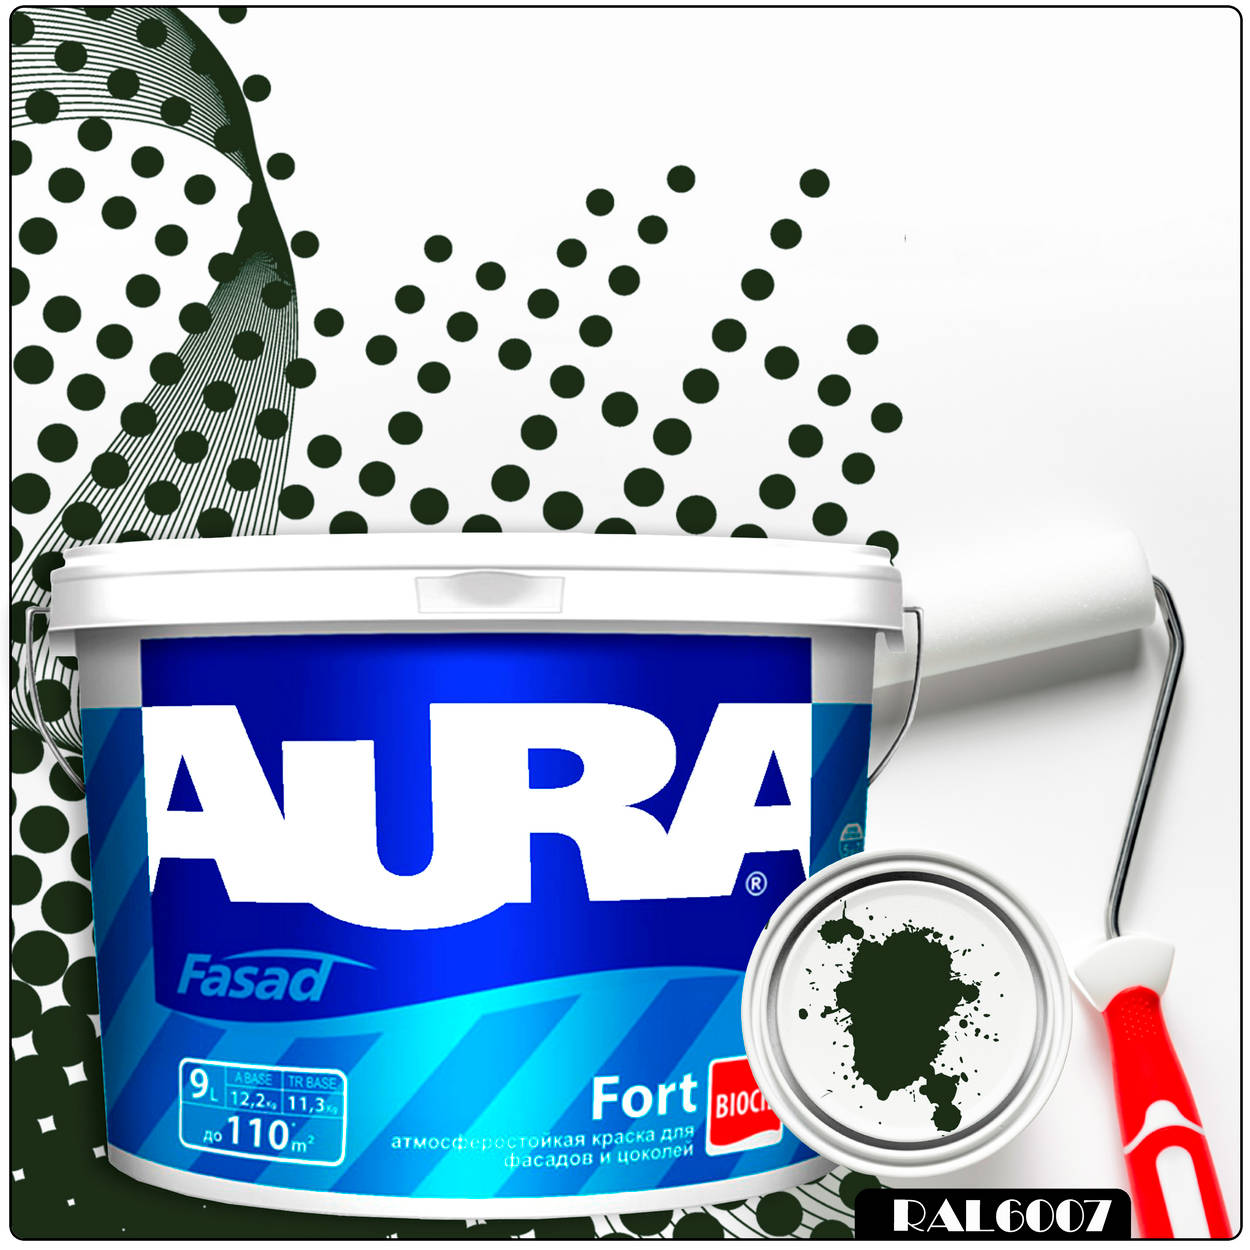 Фото 8 - Краска Aura Fasad Fort, RAL 6007 Бутылочно-зеленый, латексная, матовая, для фасада и цоколей, 9л, Аура.